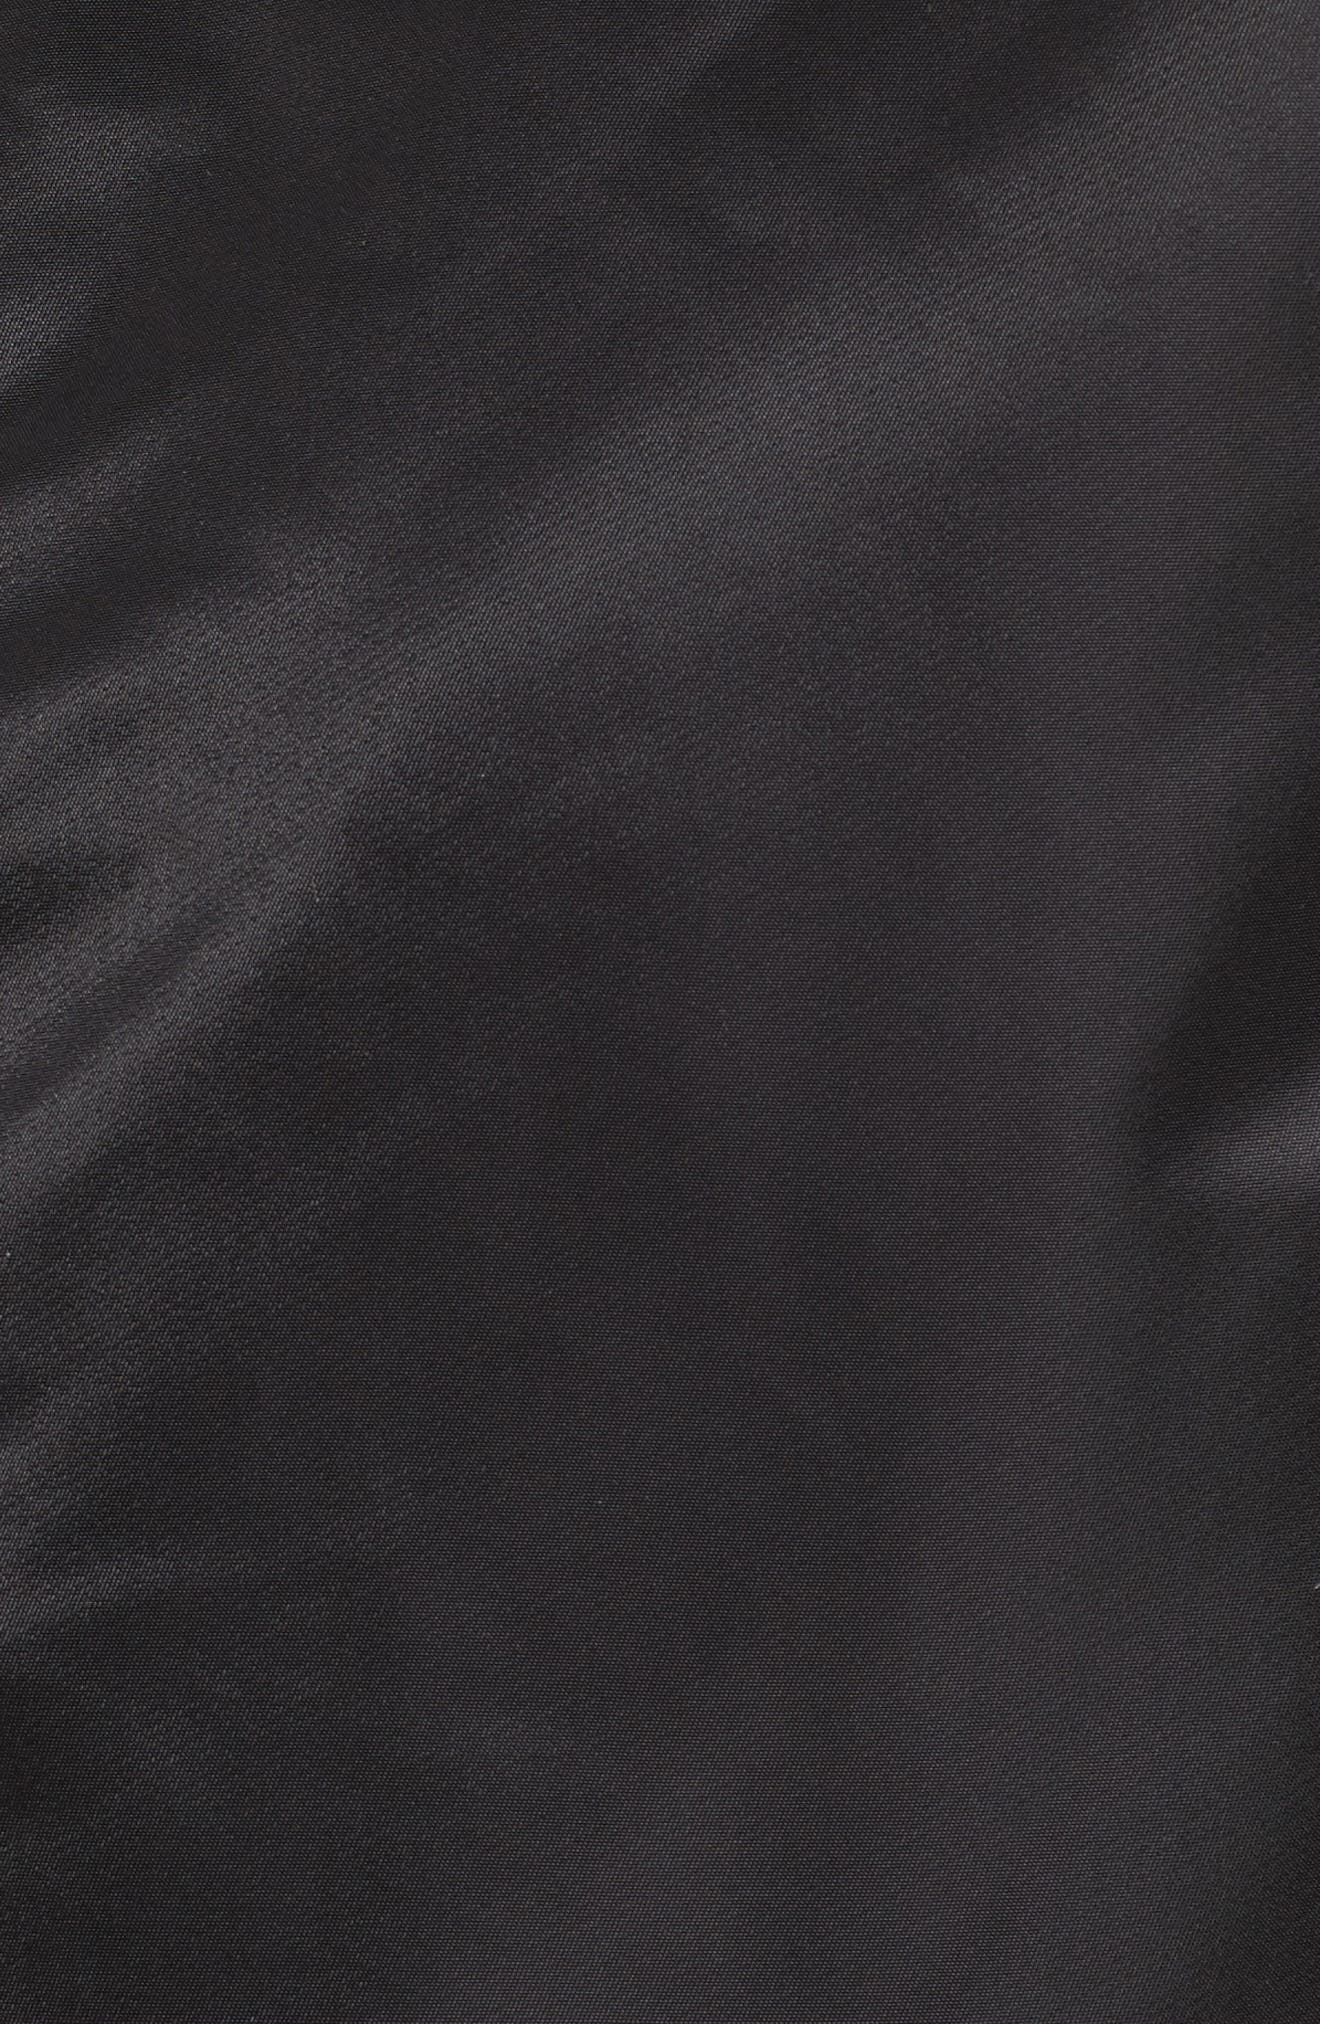 Long Souvenir Illusion MA-1 Jacket,                             Alternate thumbnail 6, color,                             Black